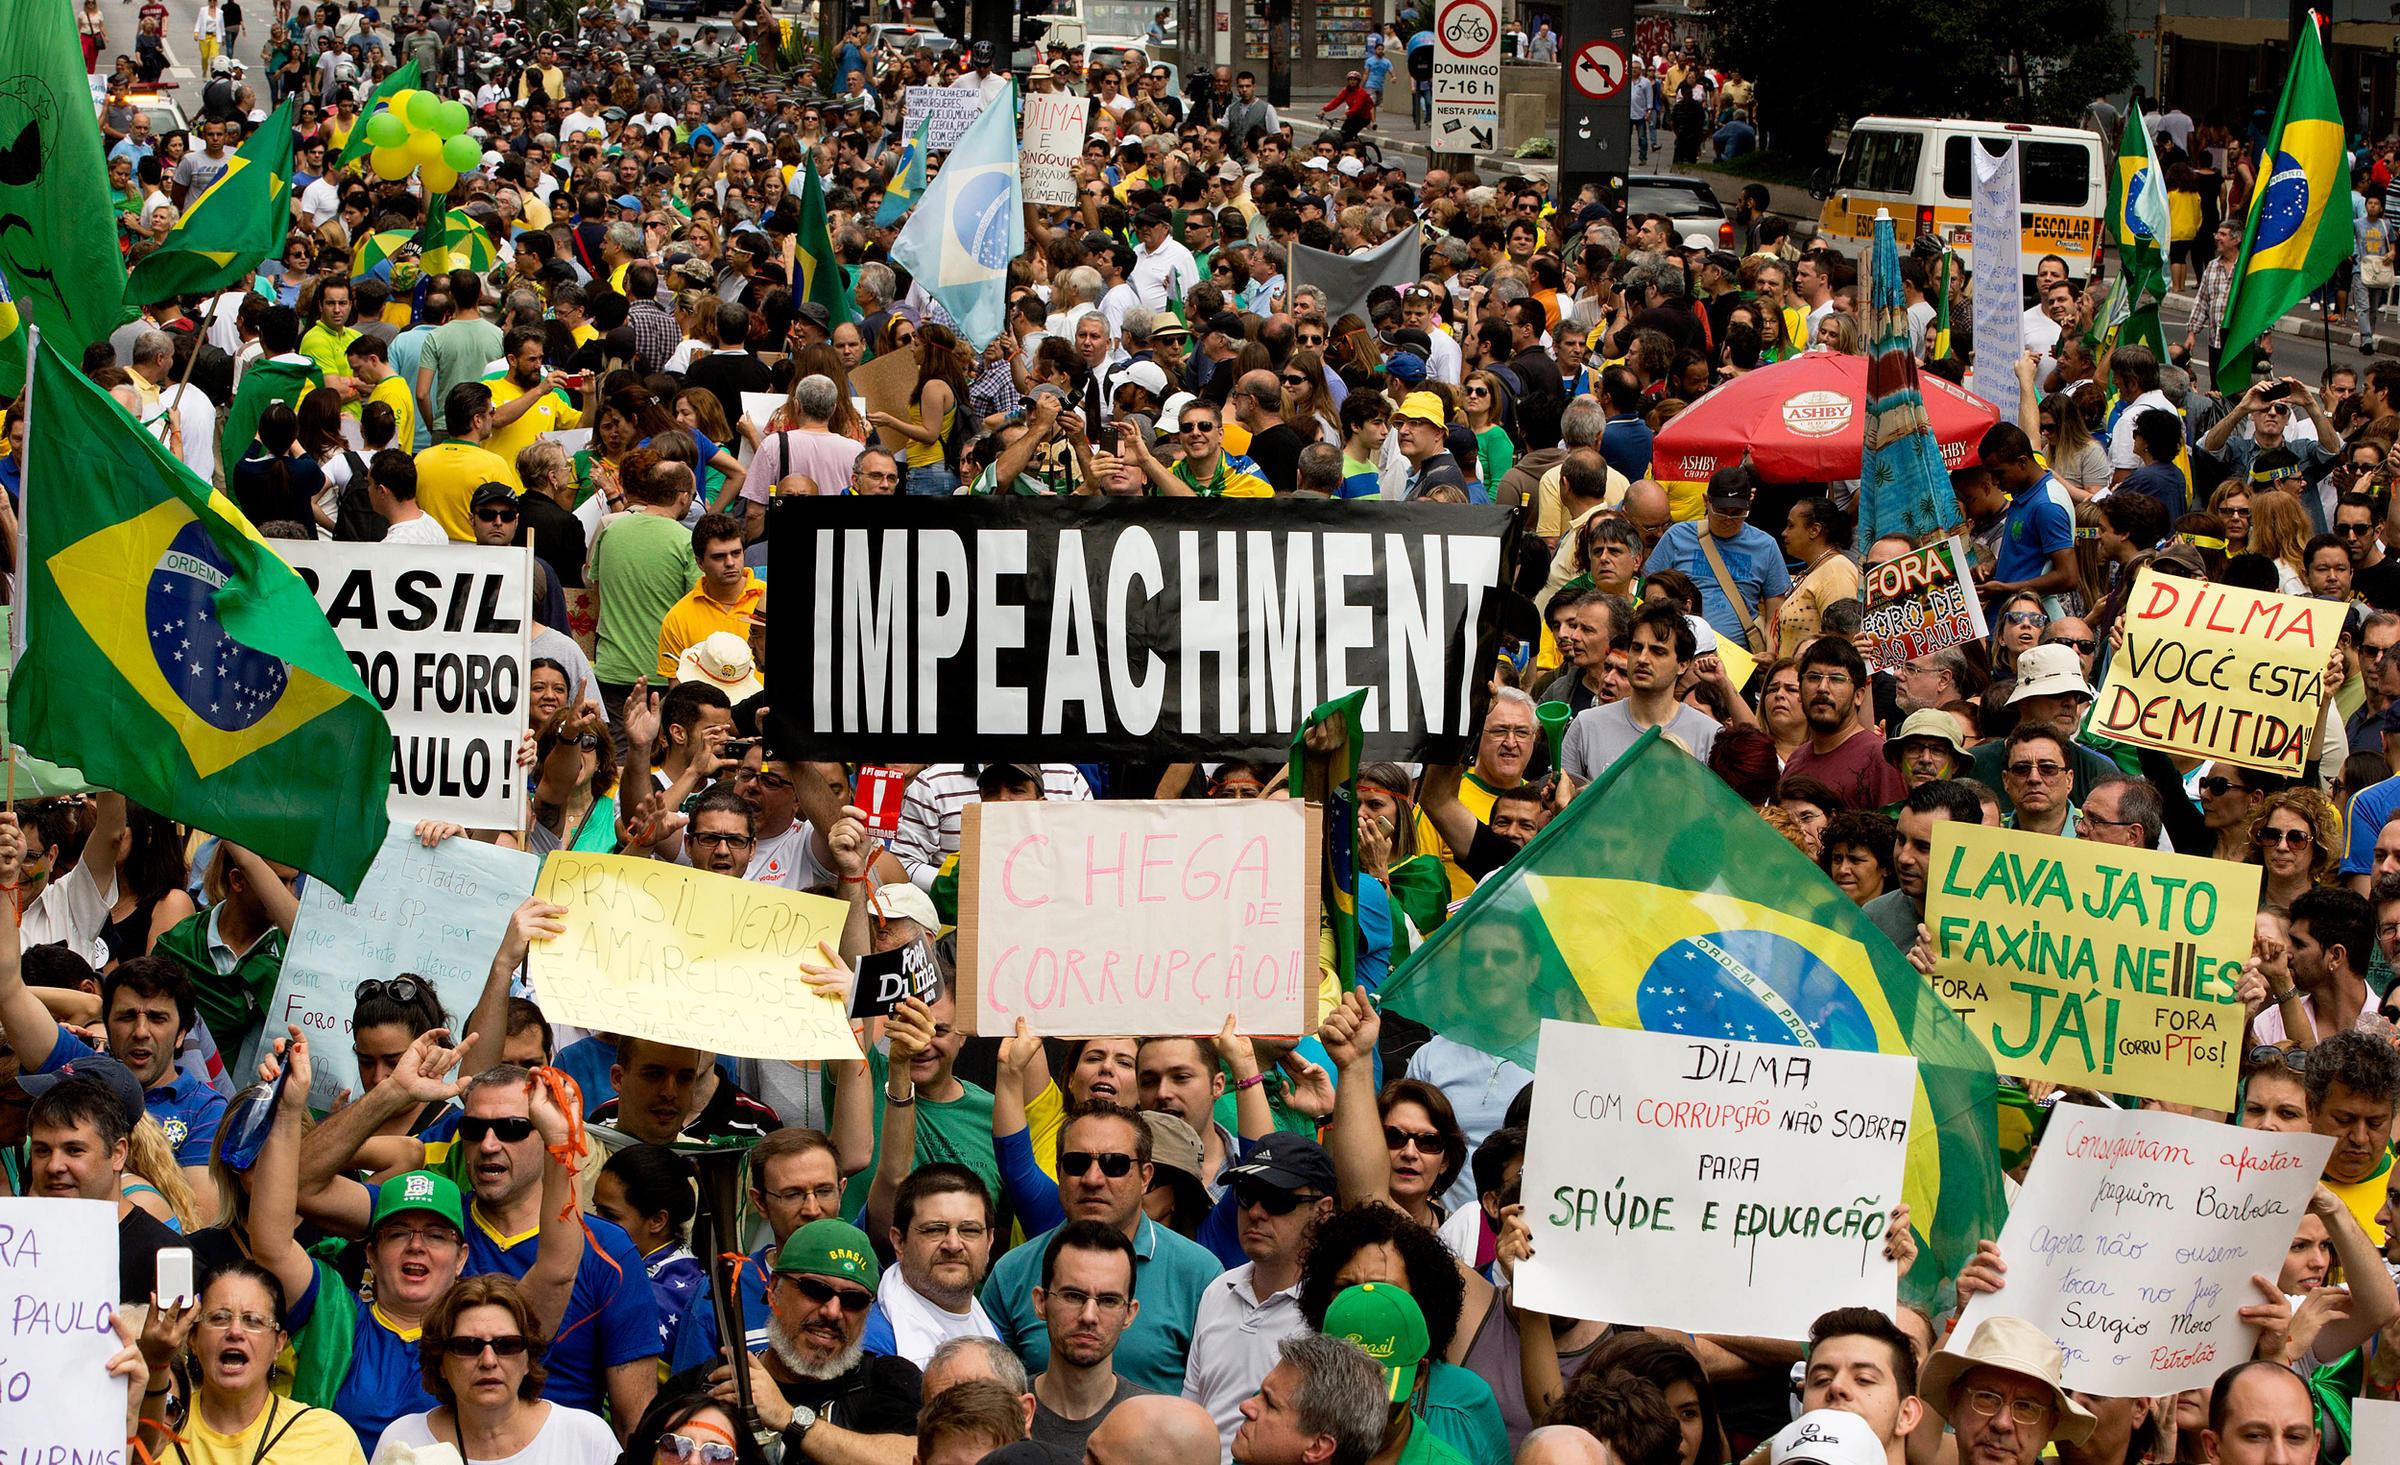 impeachment - photo #46